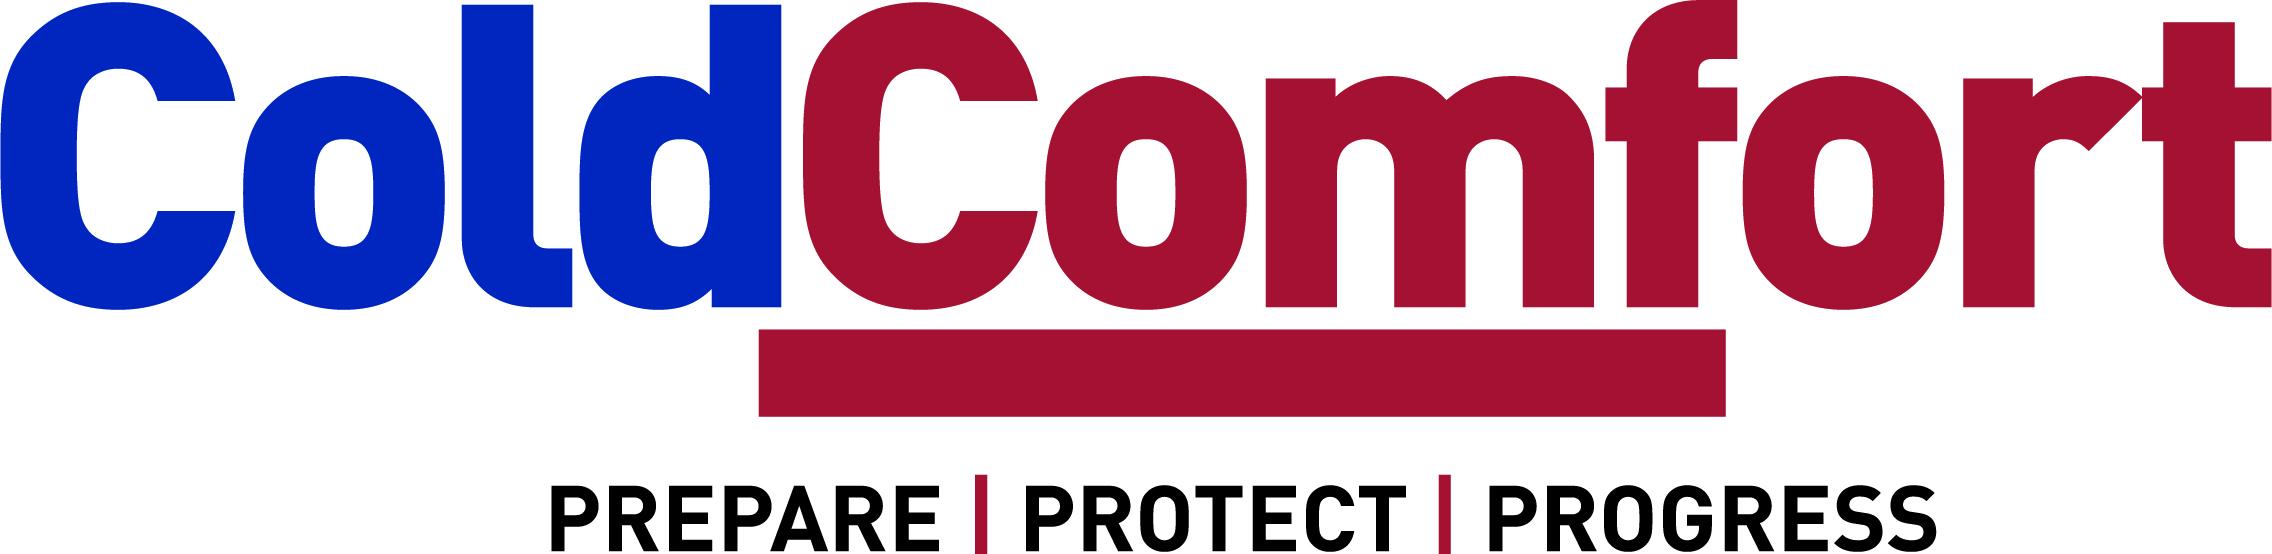 Cold Comfort Harrogate logo